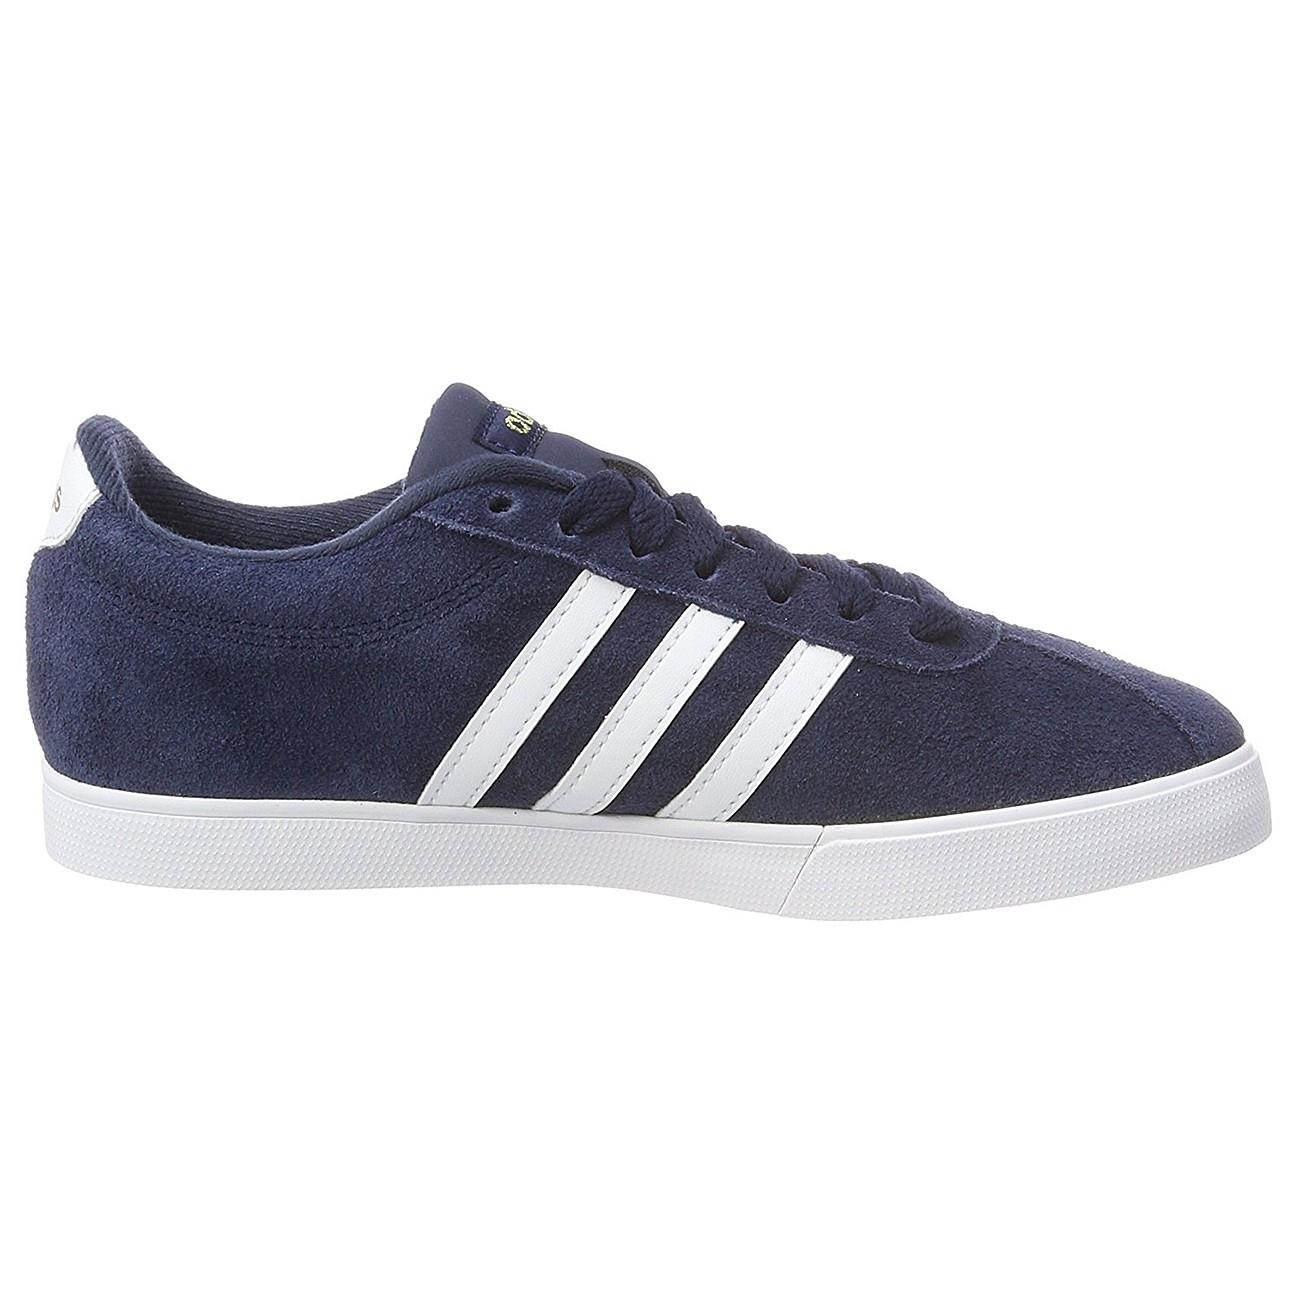 Sneakers Adidas Courtset Femme bleu